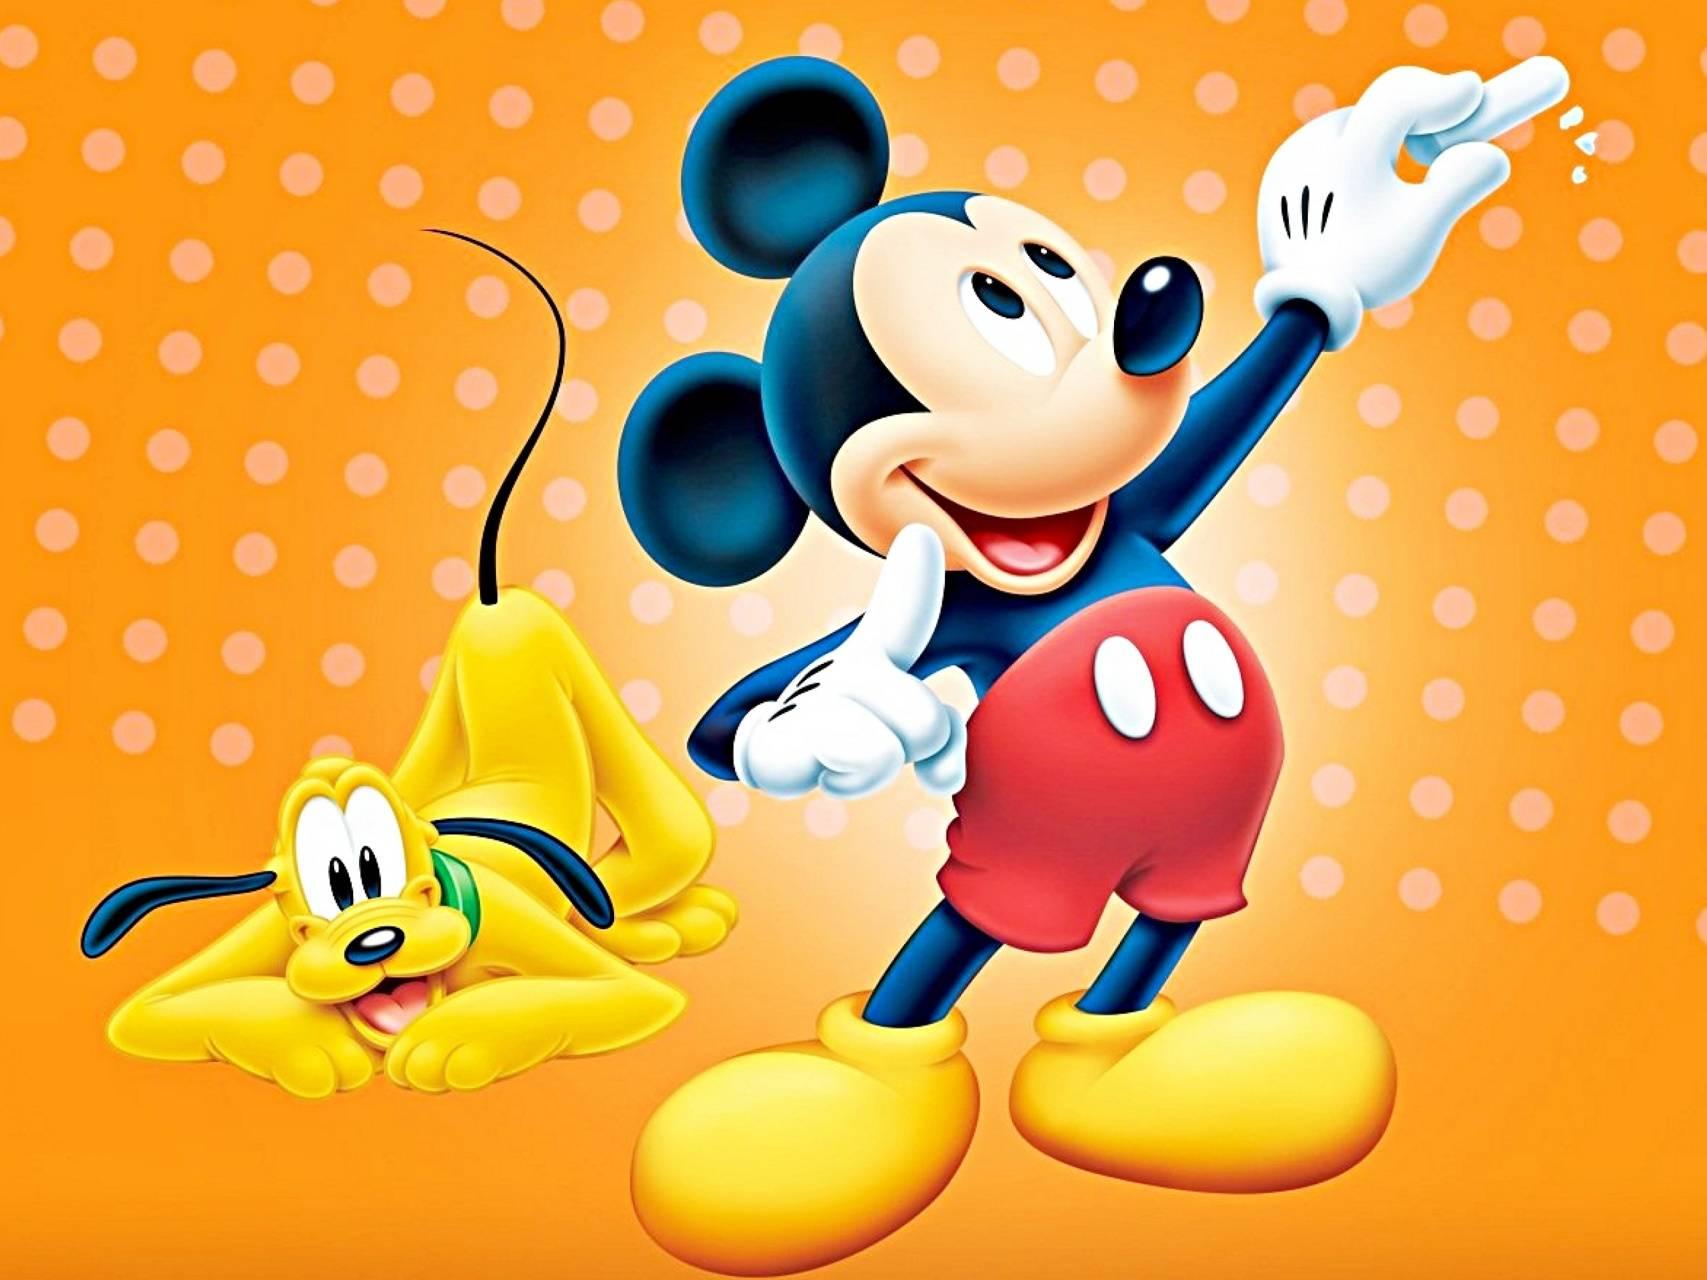 Mickey and Pluto